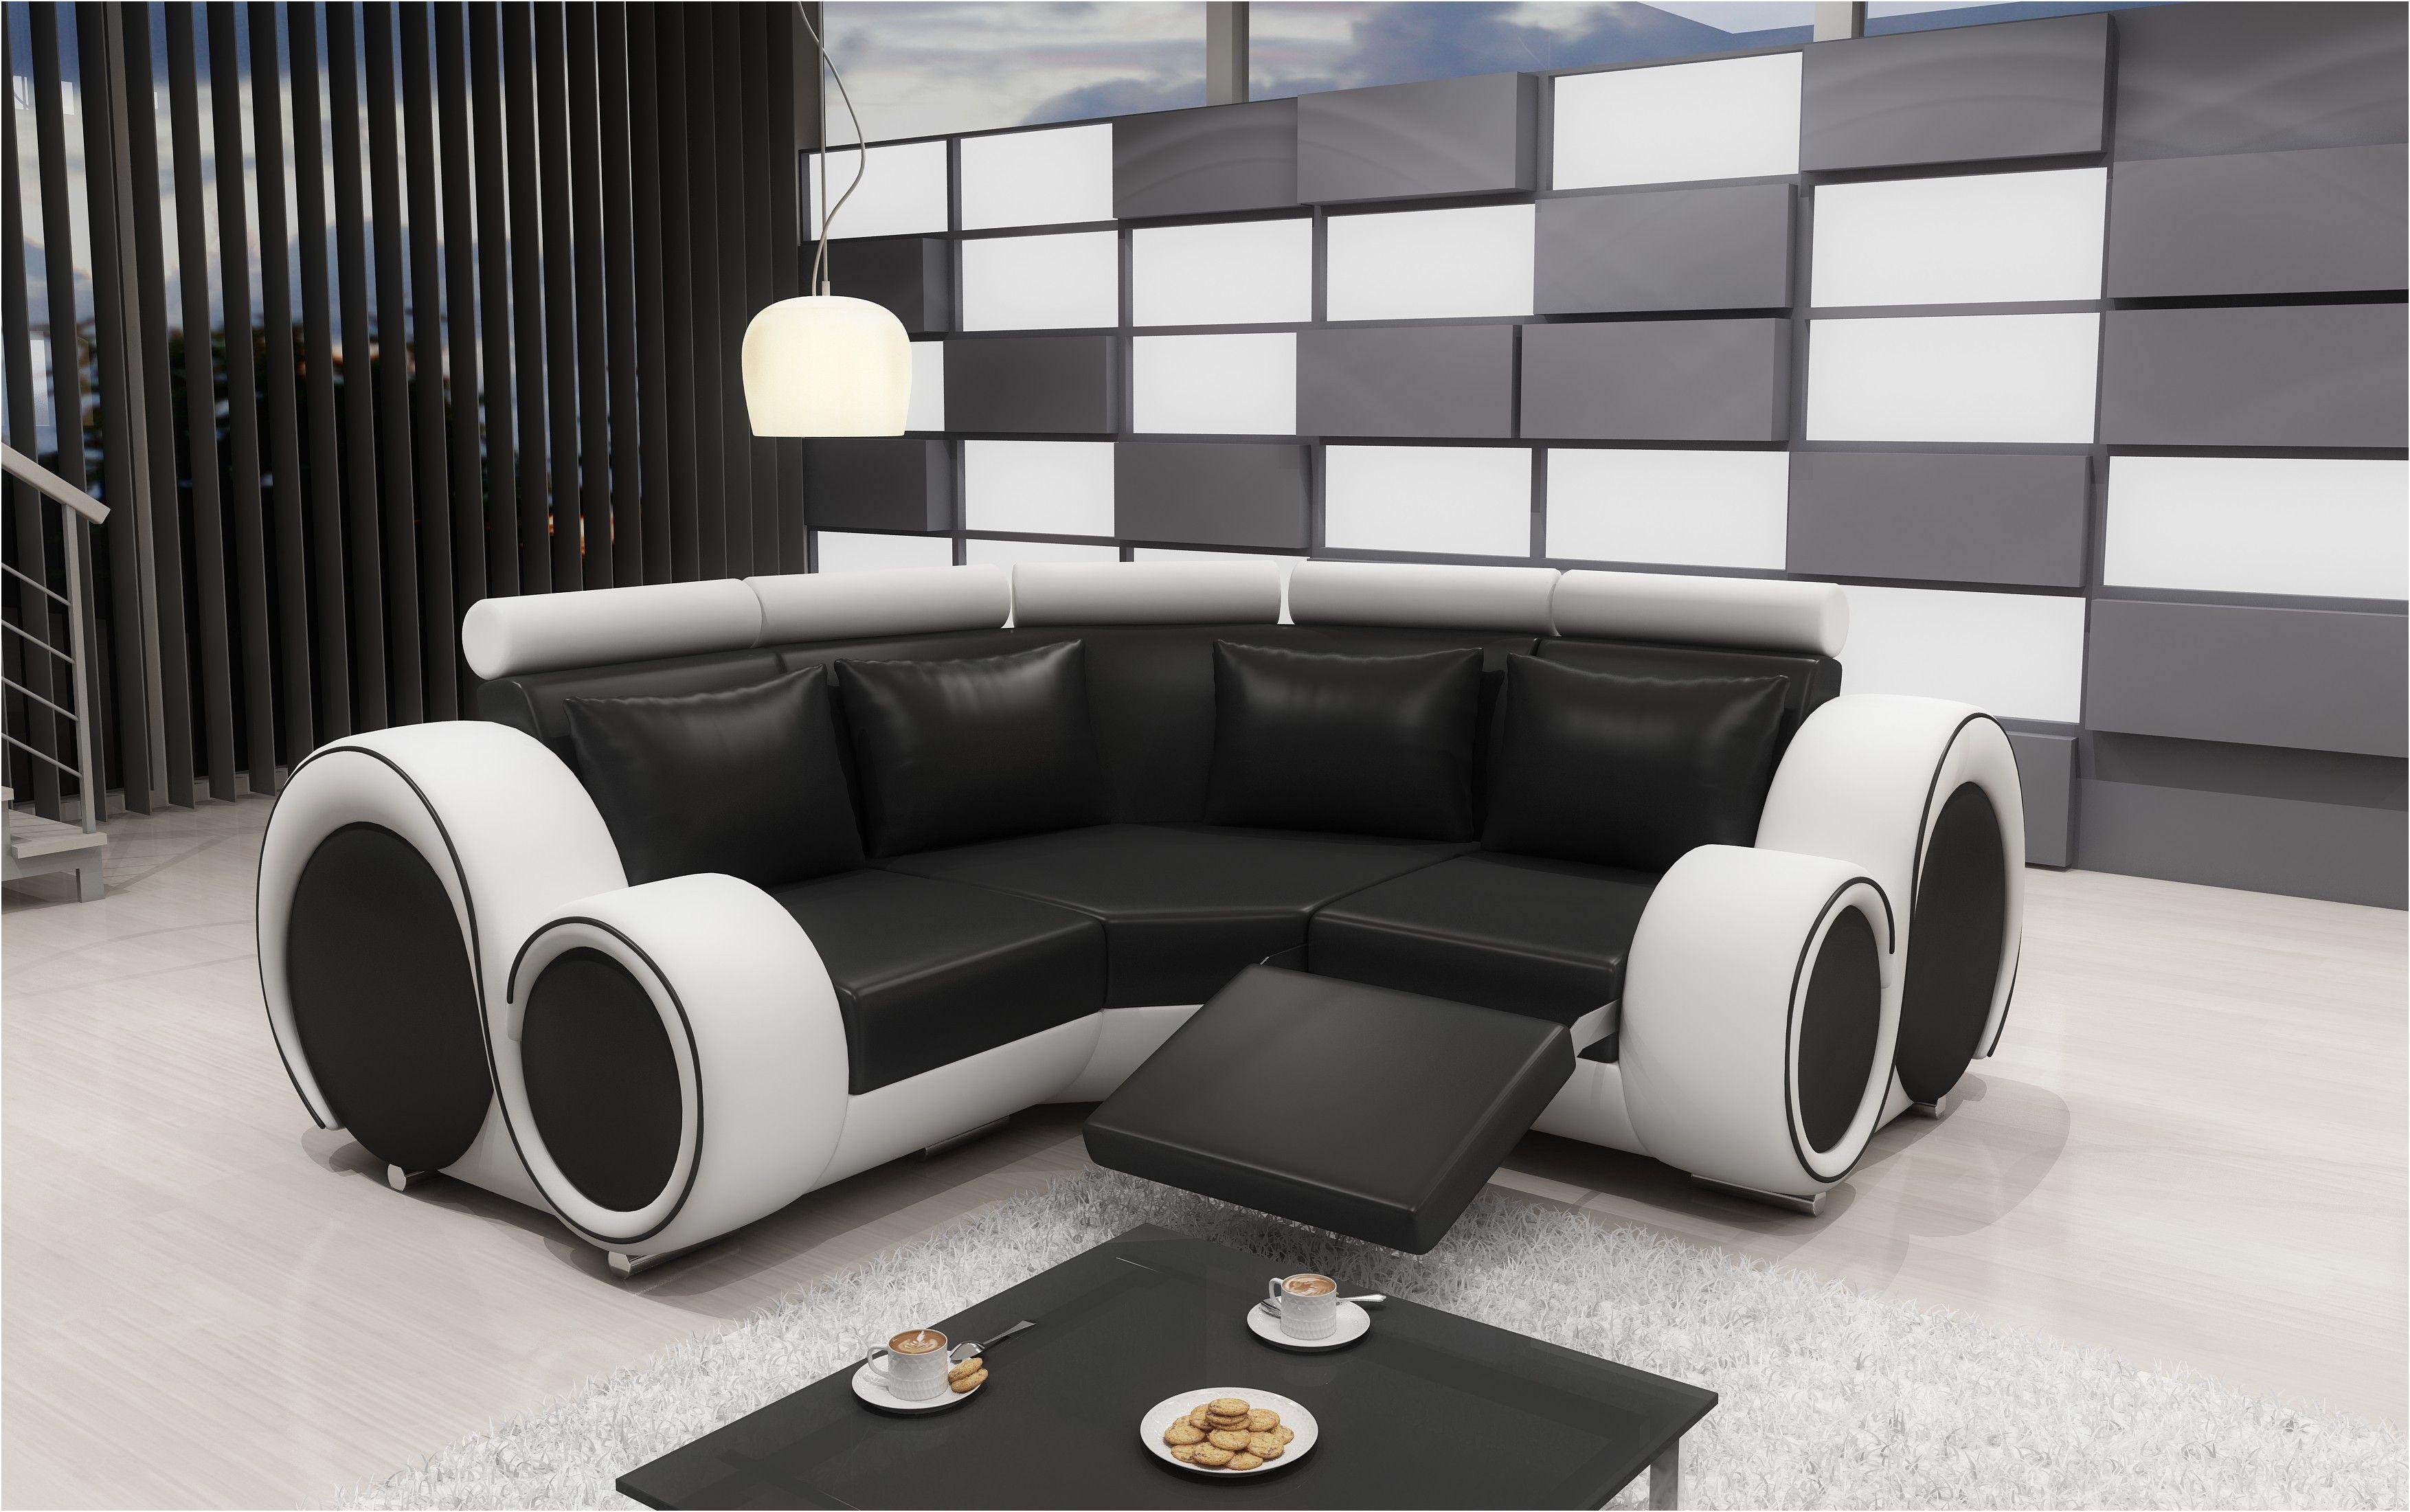 Teuer Couch Schwarz Weiß Sofa Couch Home Couch